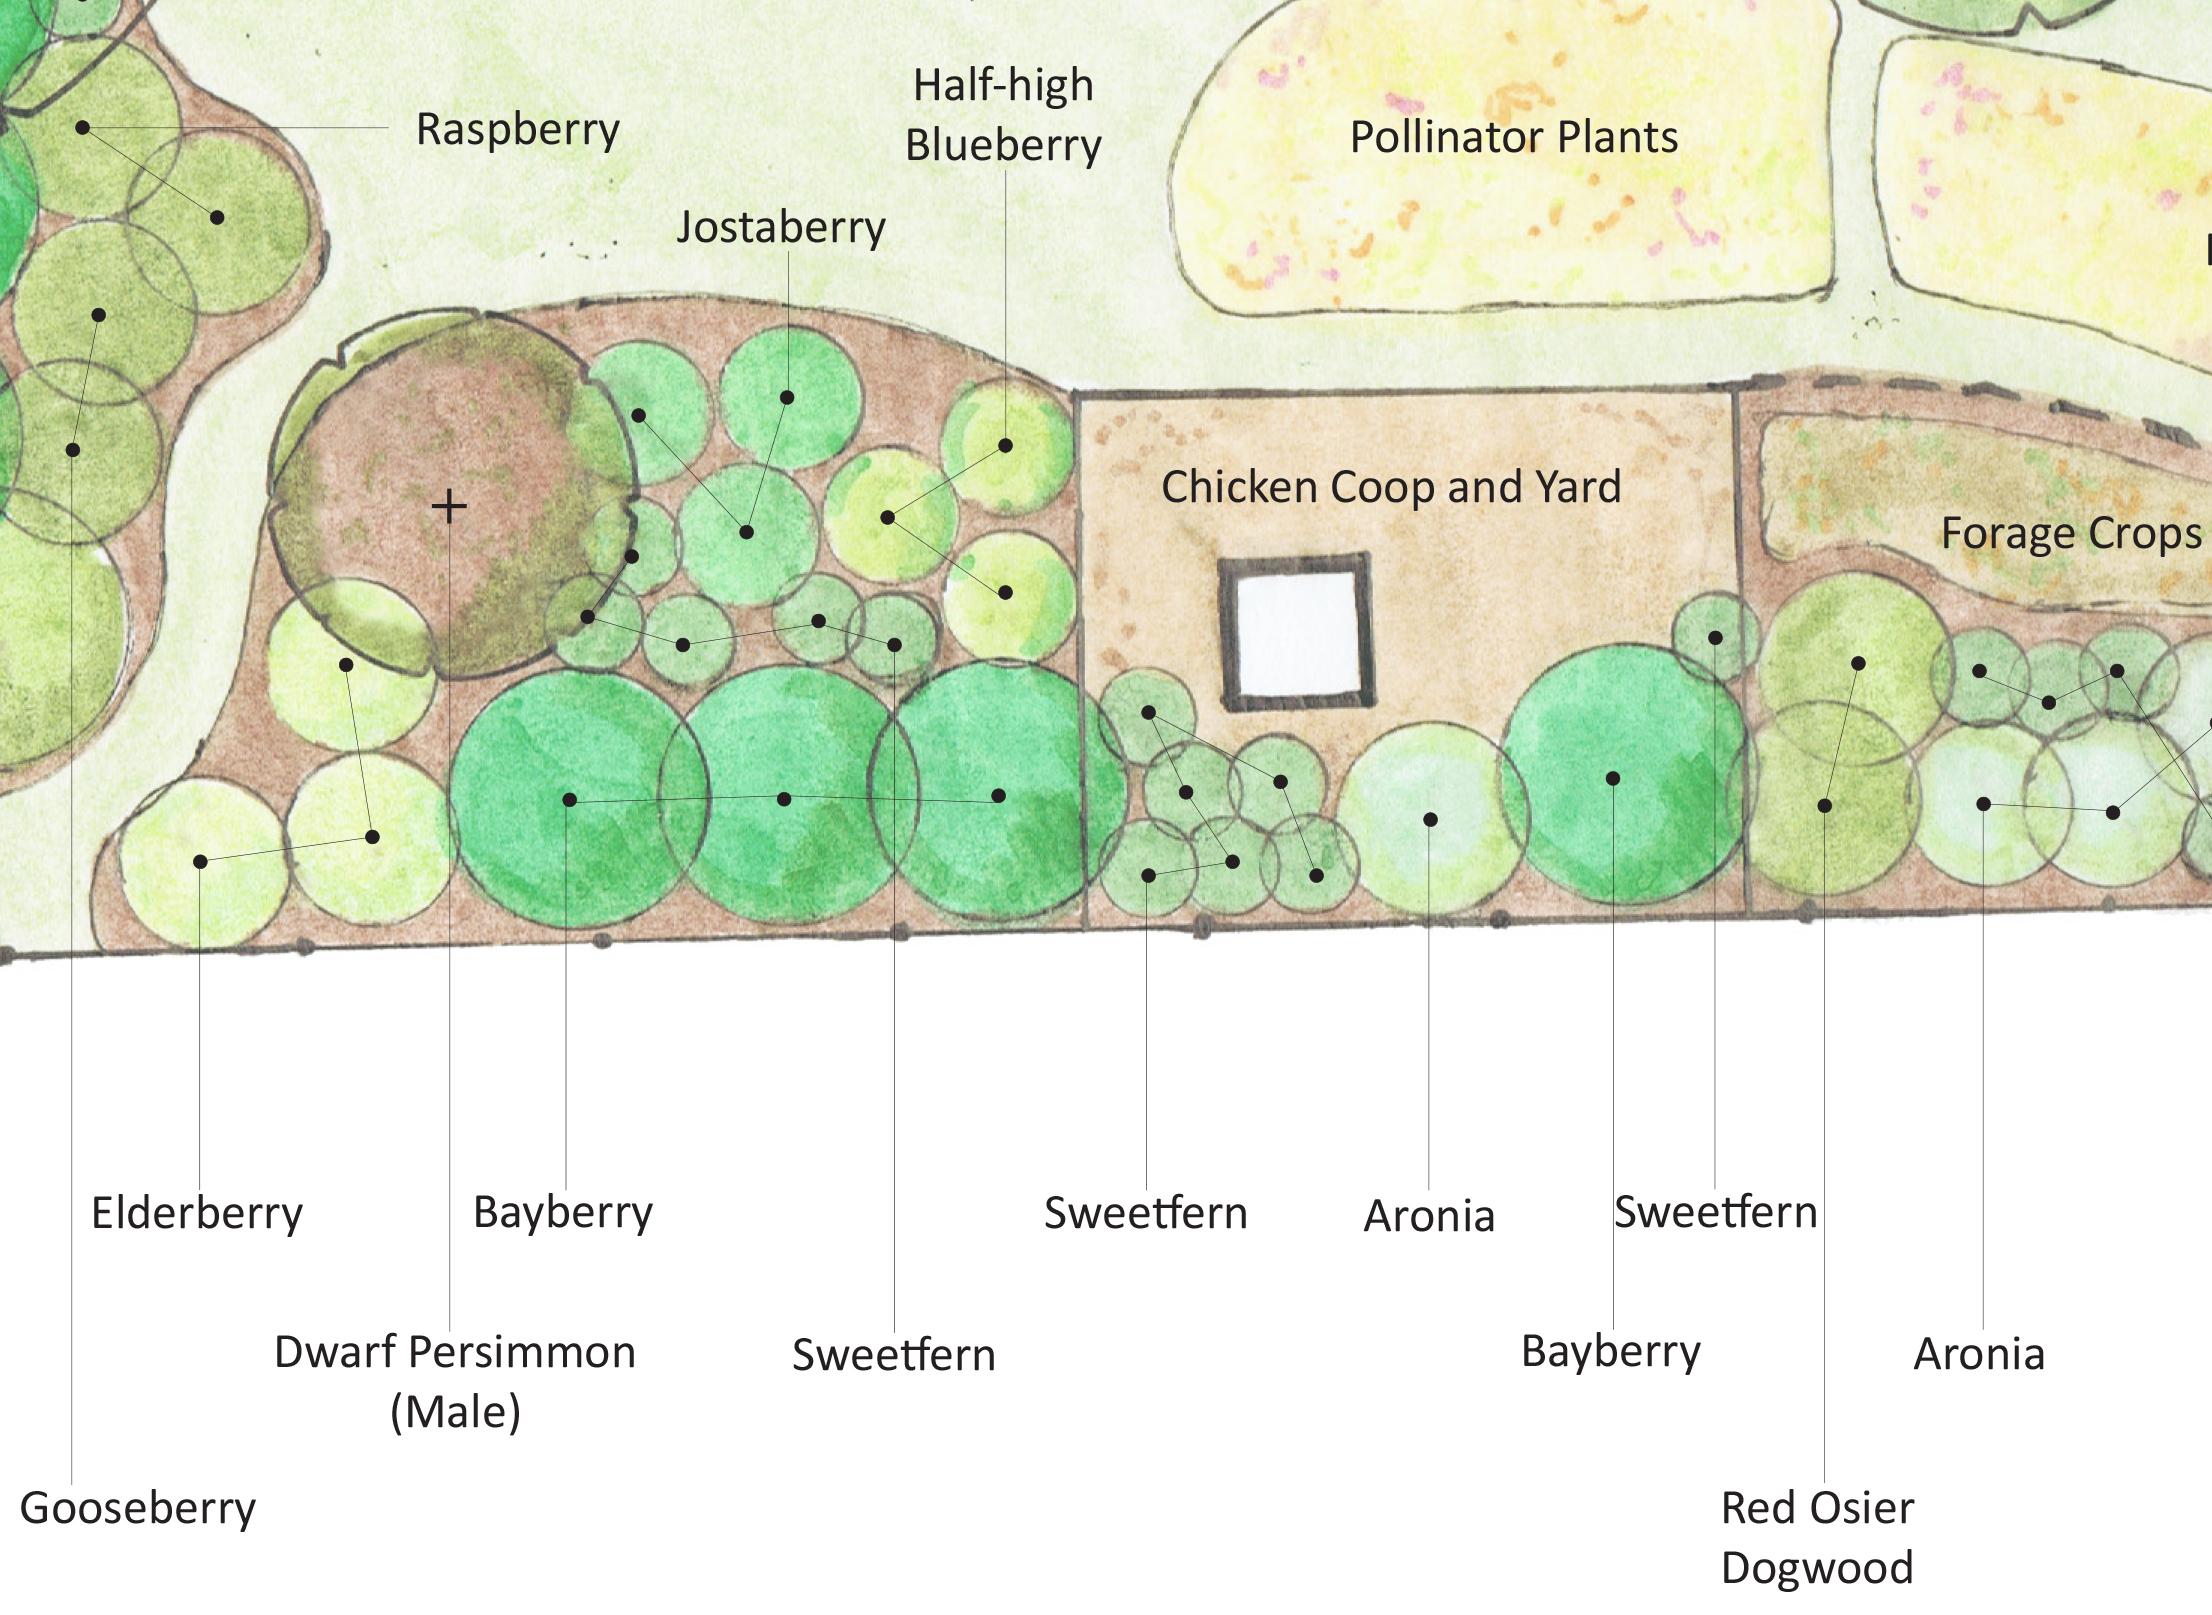 Landscape Design Finalized For The Montague Urban Homestead